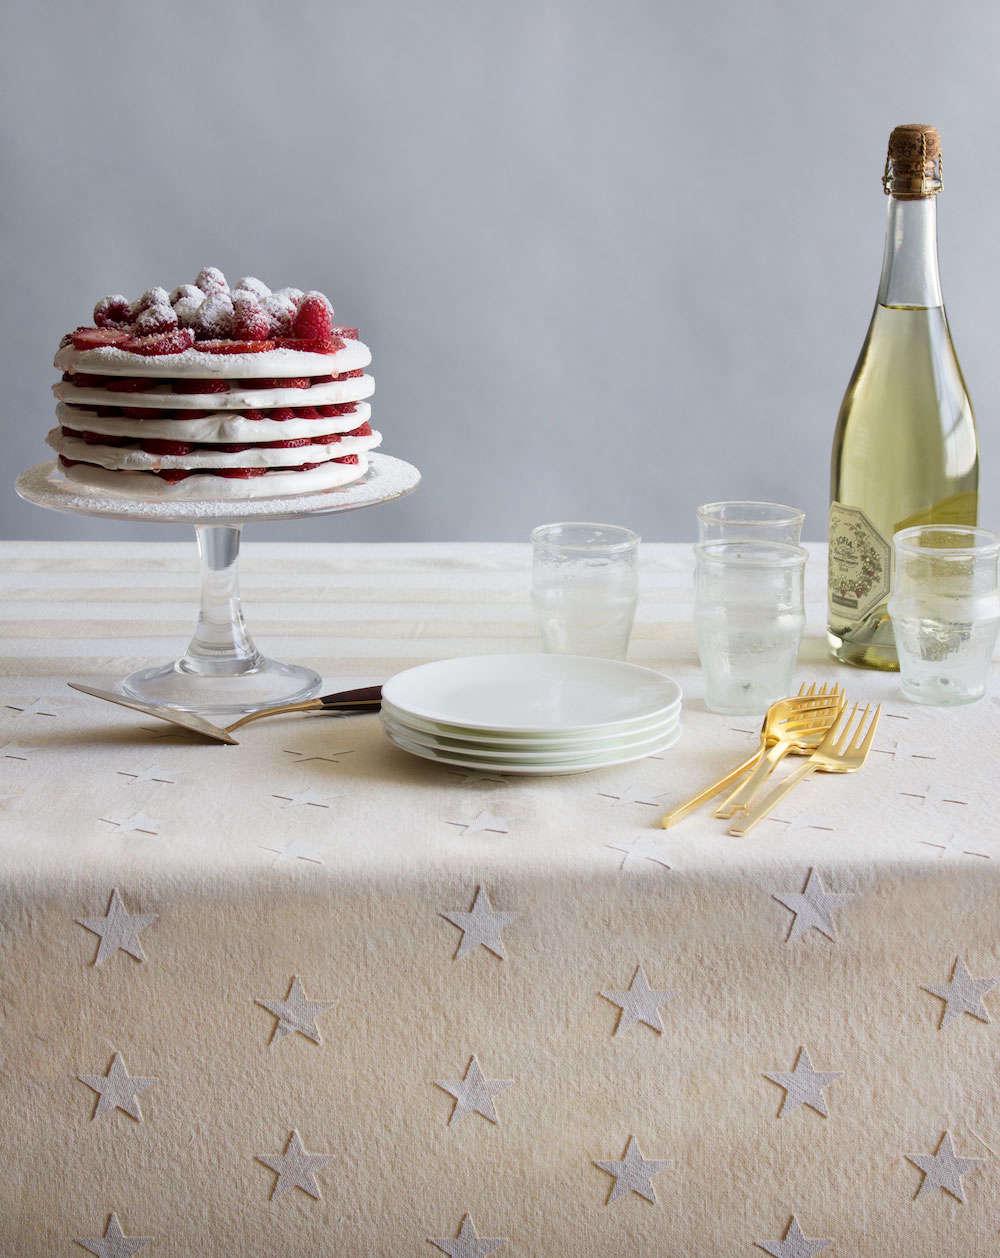 DIY Fourth of July Tablecloth by David Stark | Gardenista